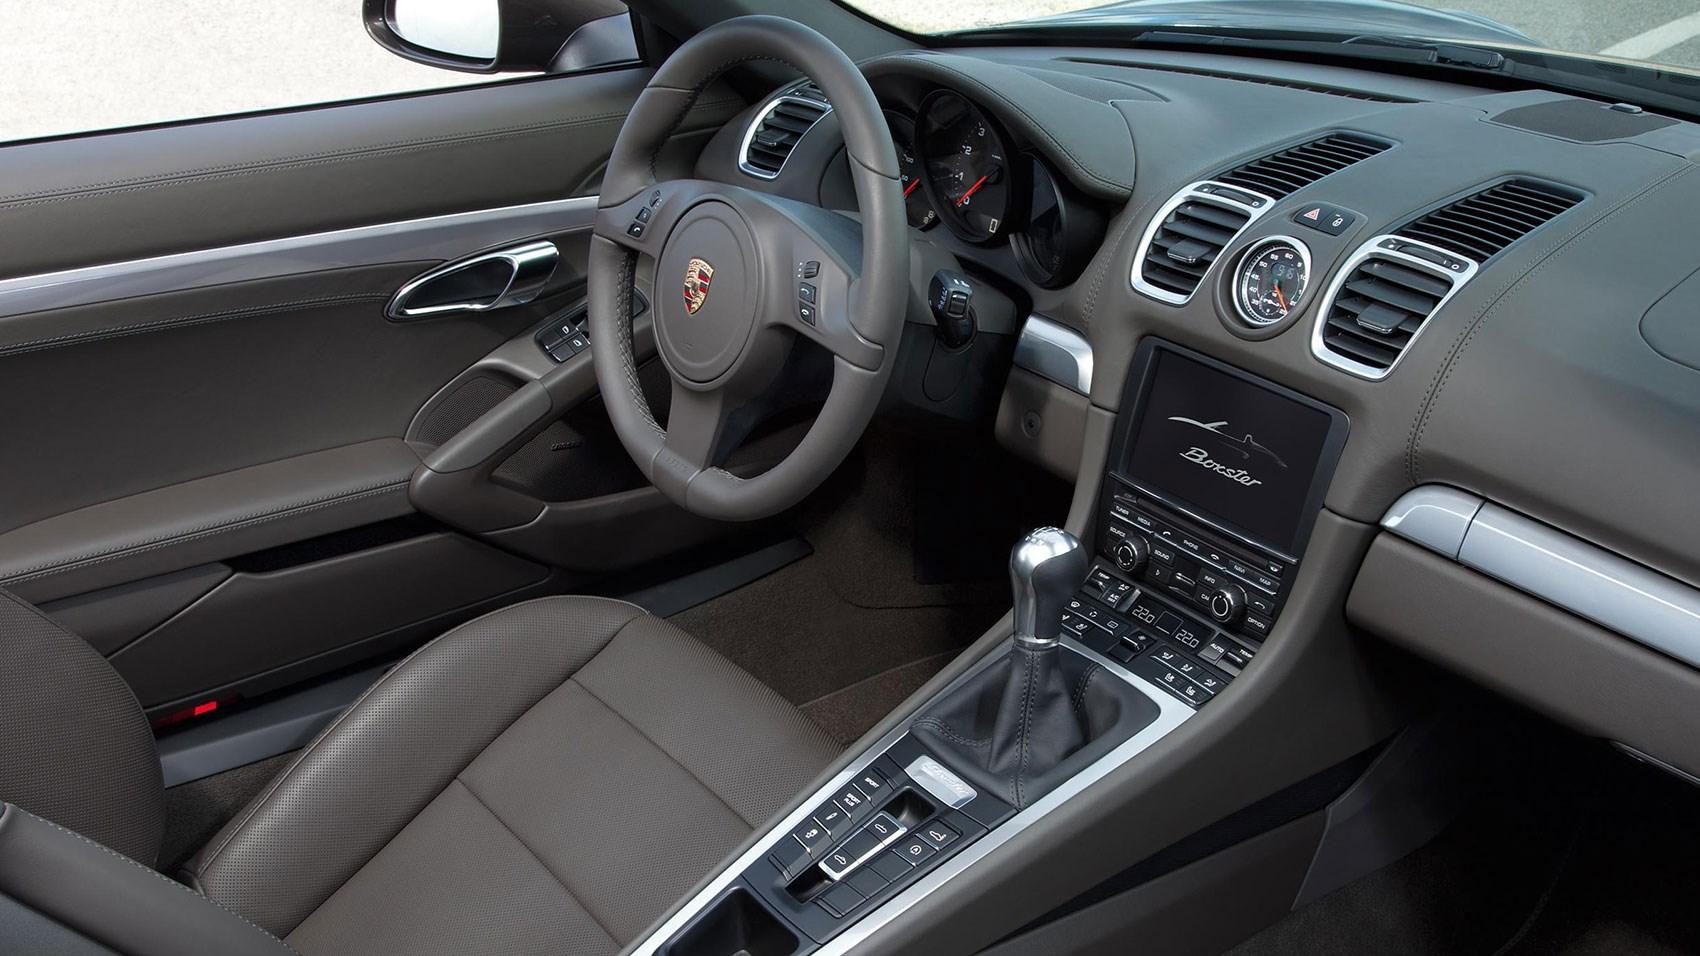 2014 Porsche Boxster Manual Cayenne Engine Diagram Motorola T605 User